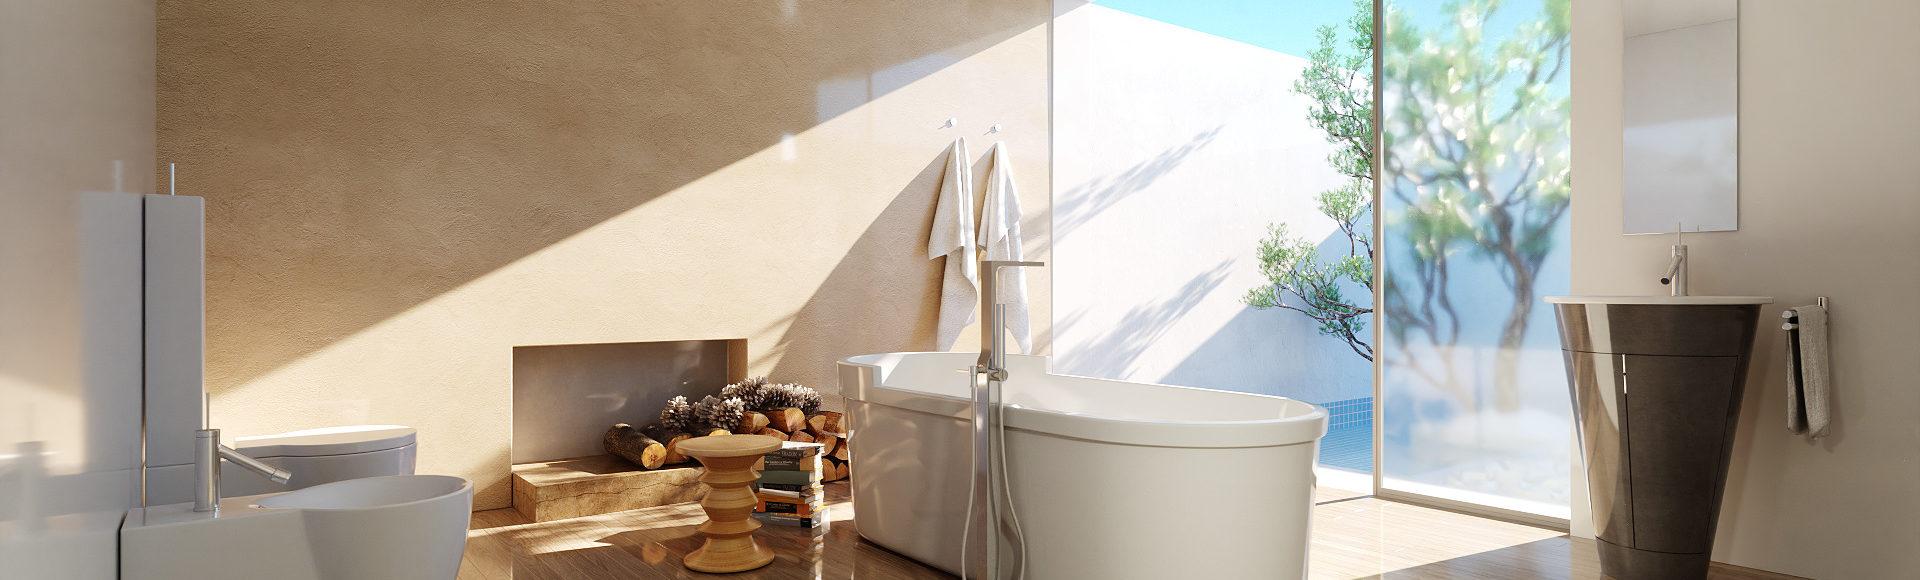 Perspectiviste 3D de salle de bain